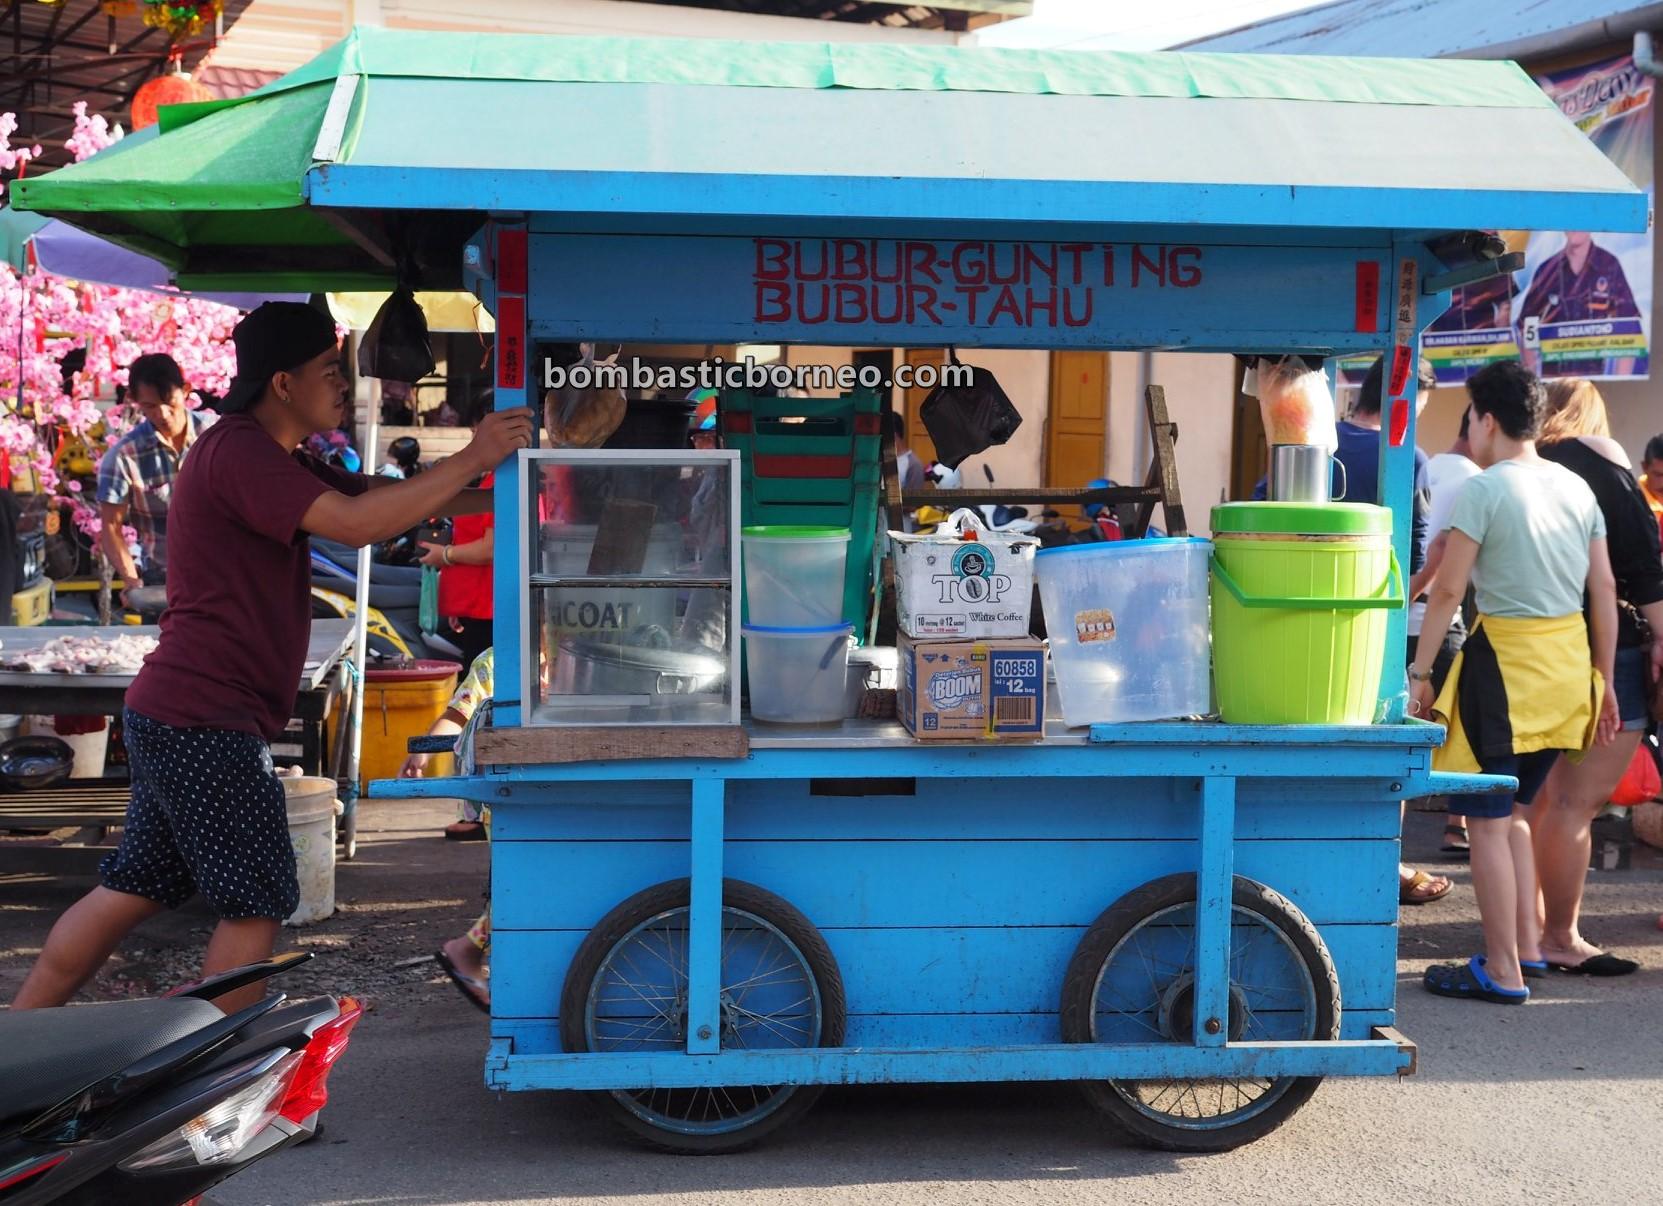 Morning Market, authentic, backpackers, destination, makanan laut, Kalimantan Barat, Kota Amoi, seafood, sayuran, vegetable, Obyek wisata, Tourism, travel guide, Trans Borneo